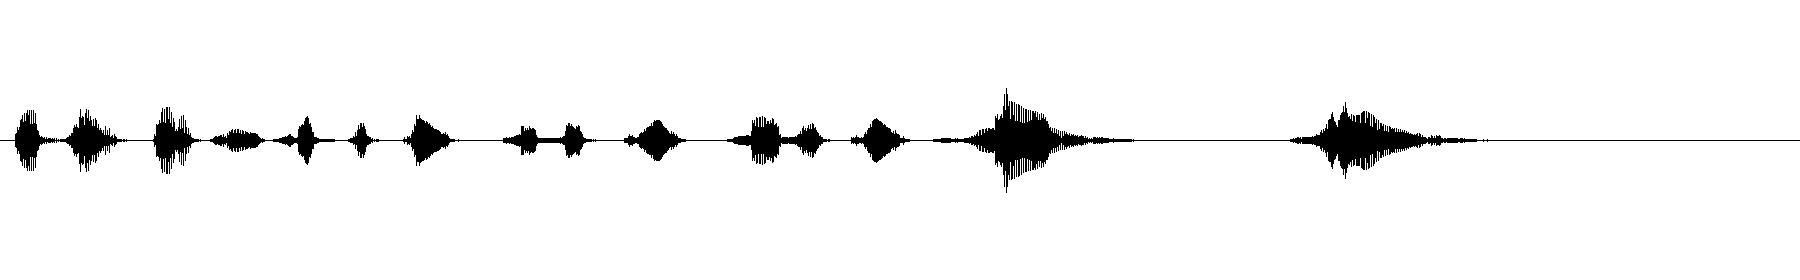 fl hrao 90bpm lyrical flow4